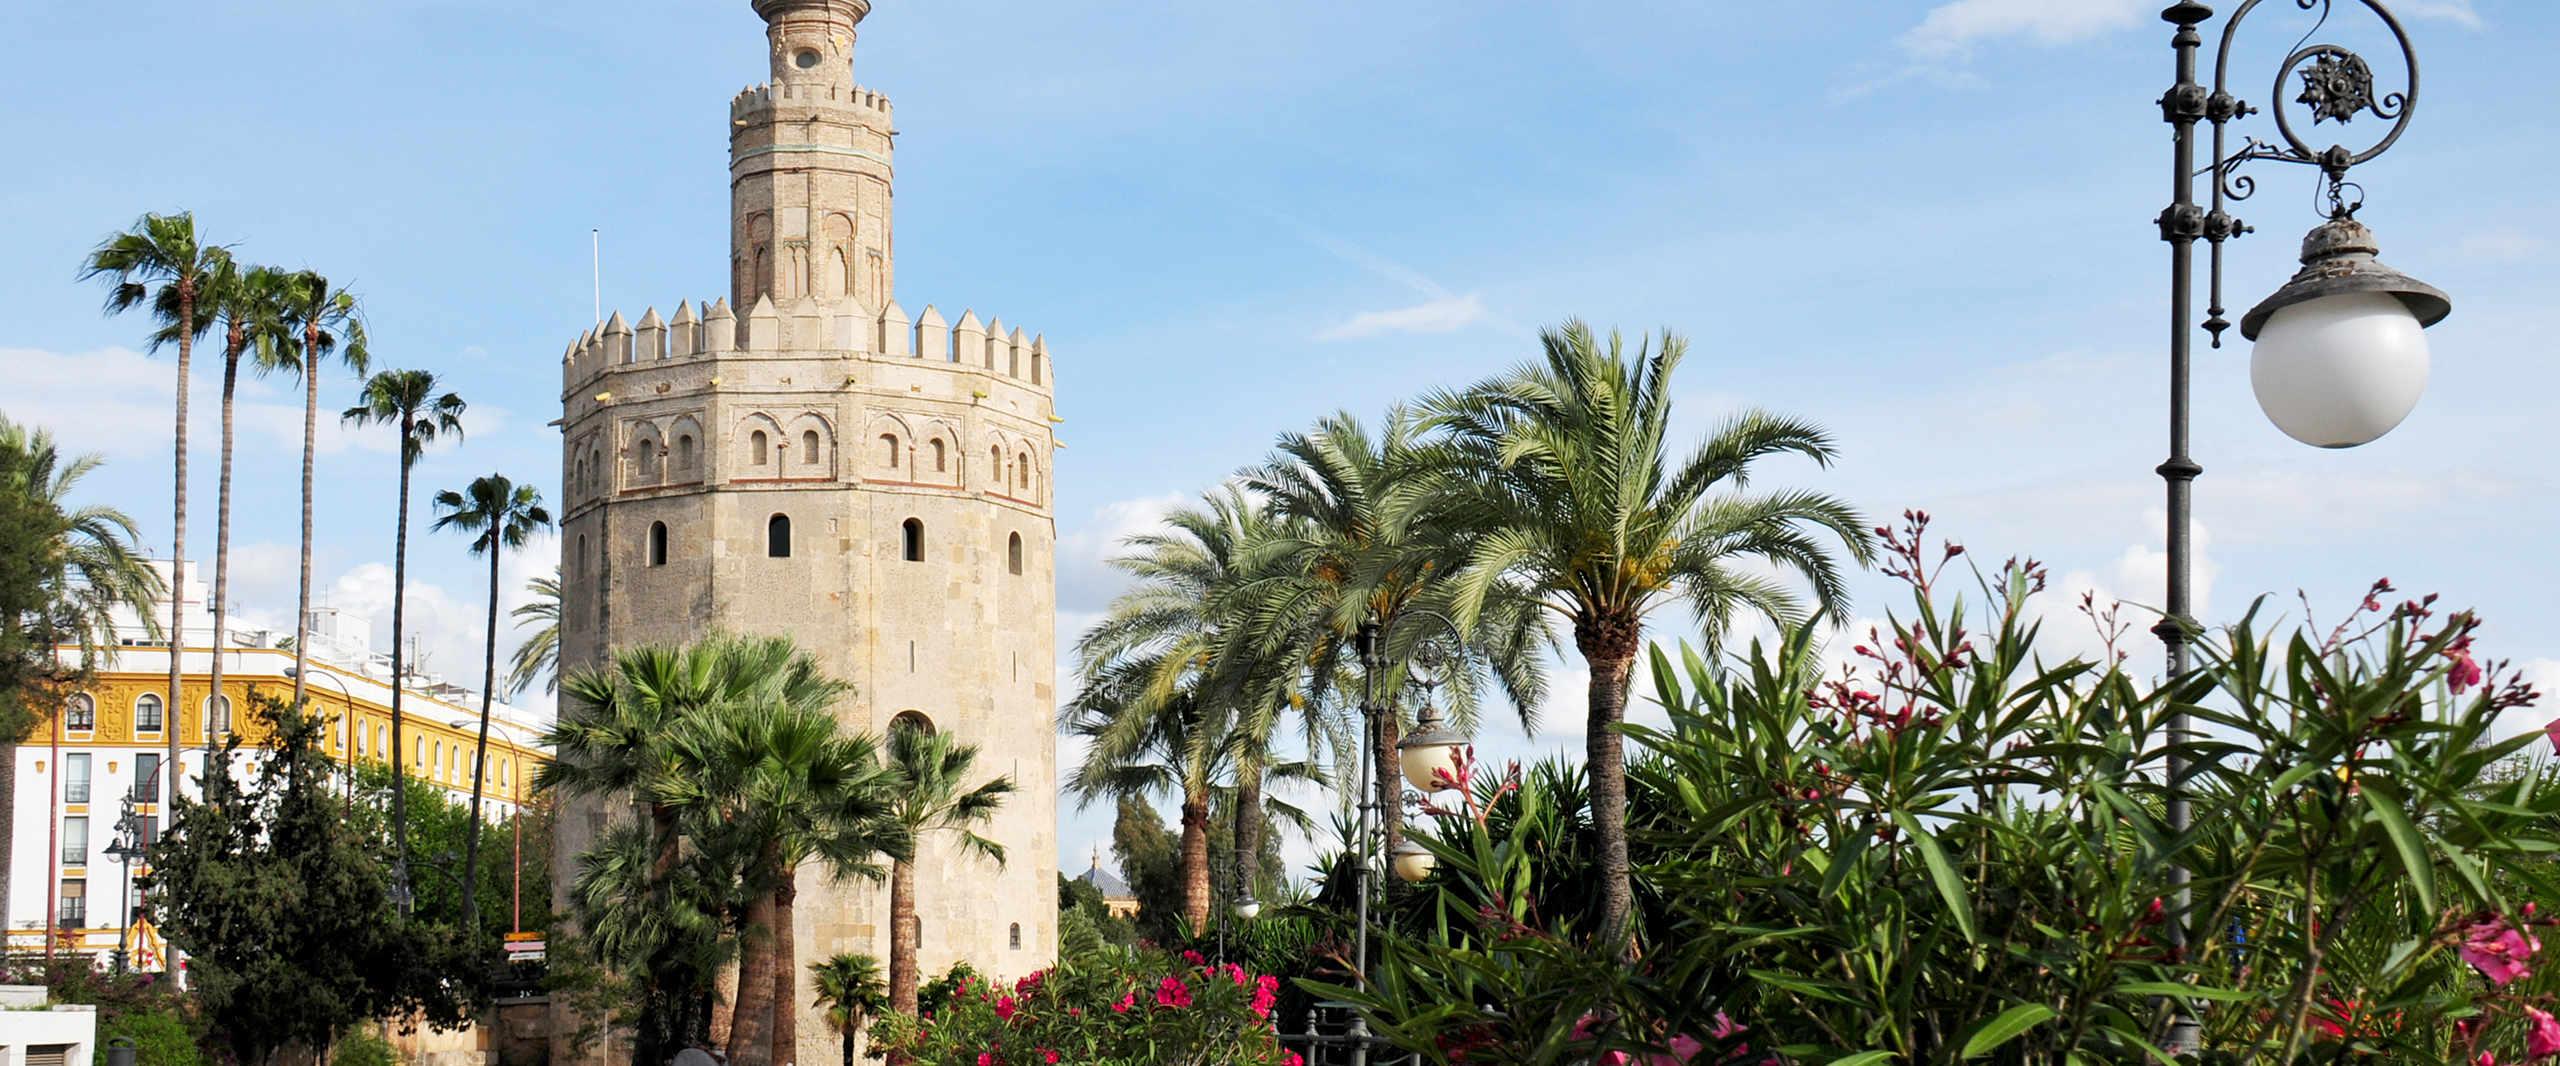 Torre del Oro mit Palmen Allee